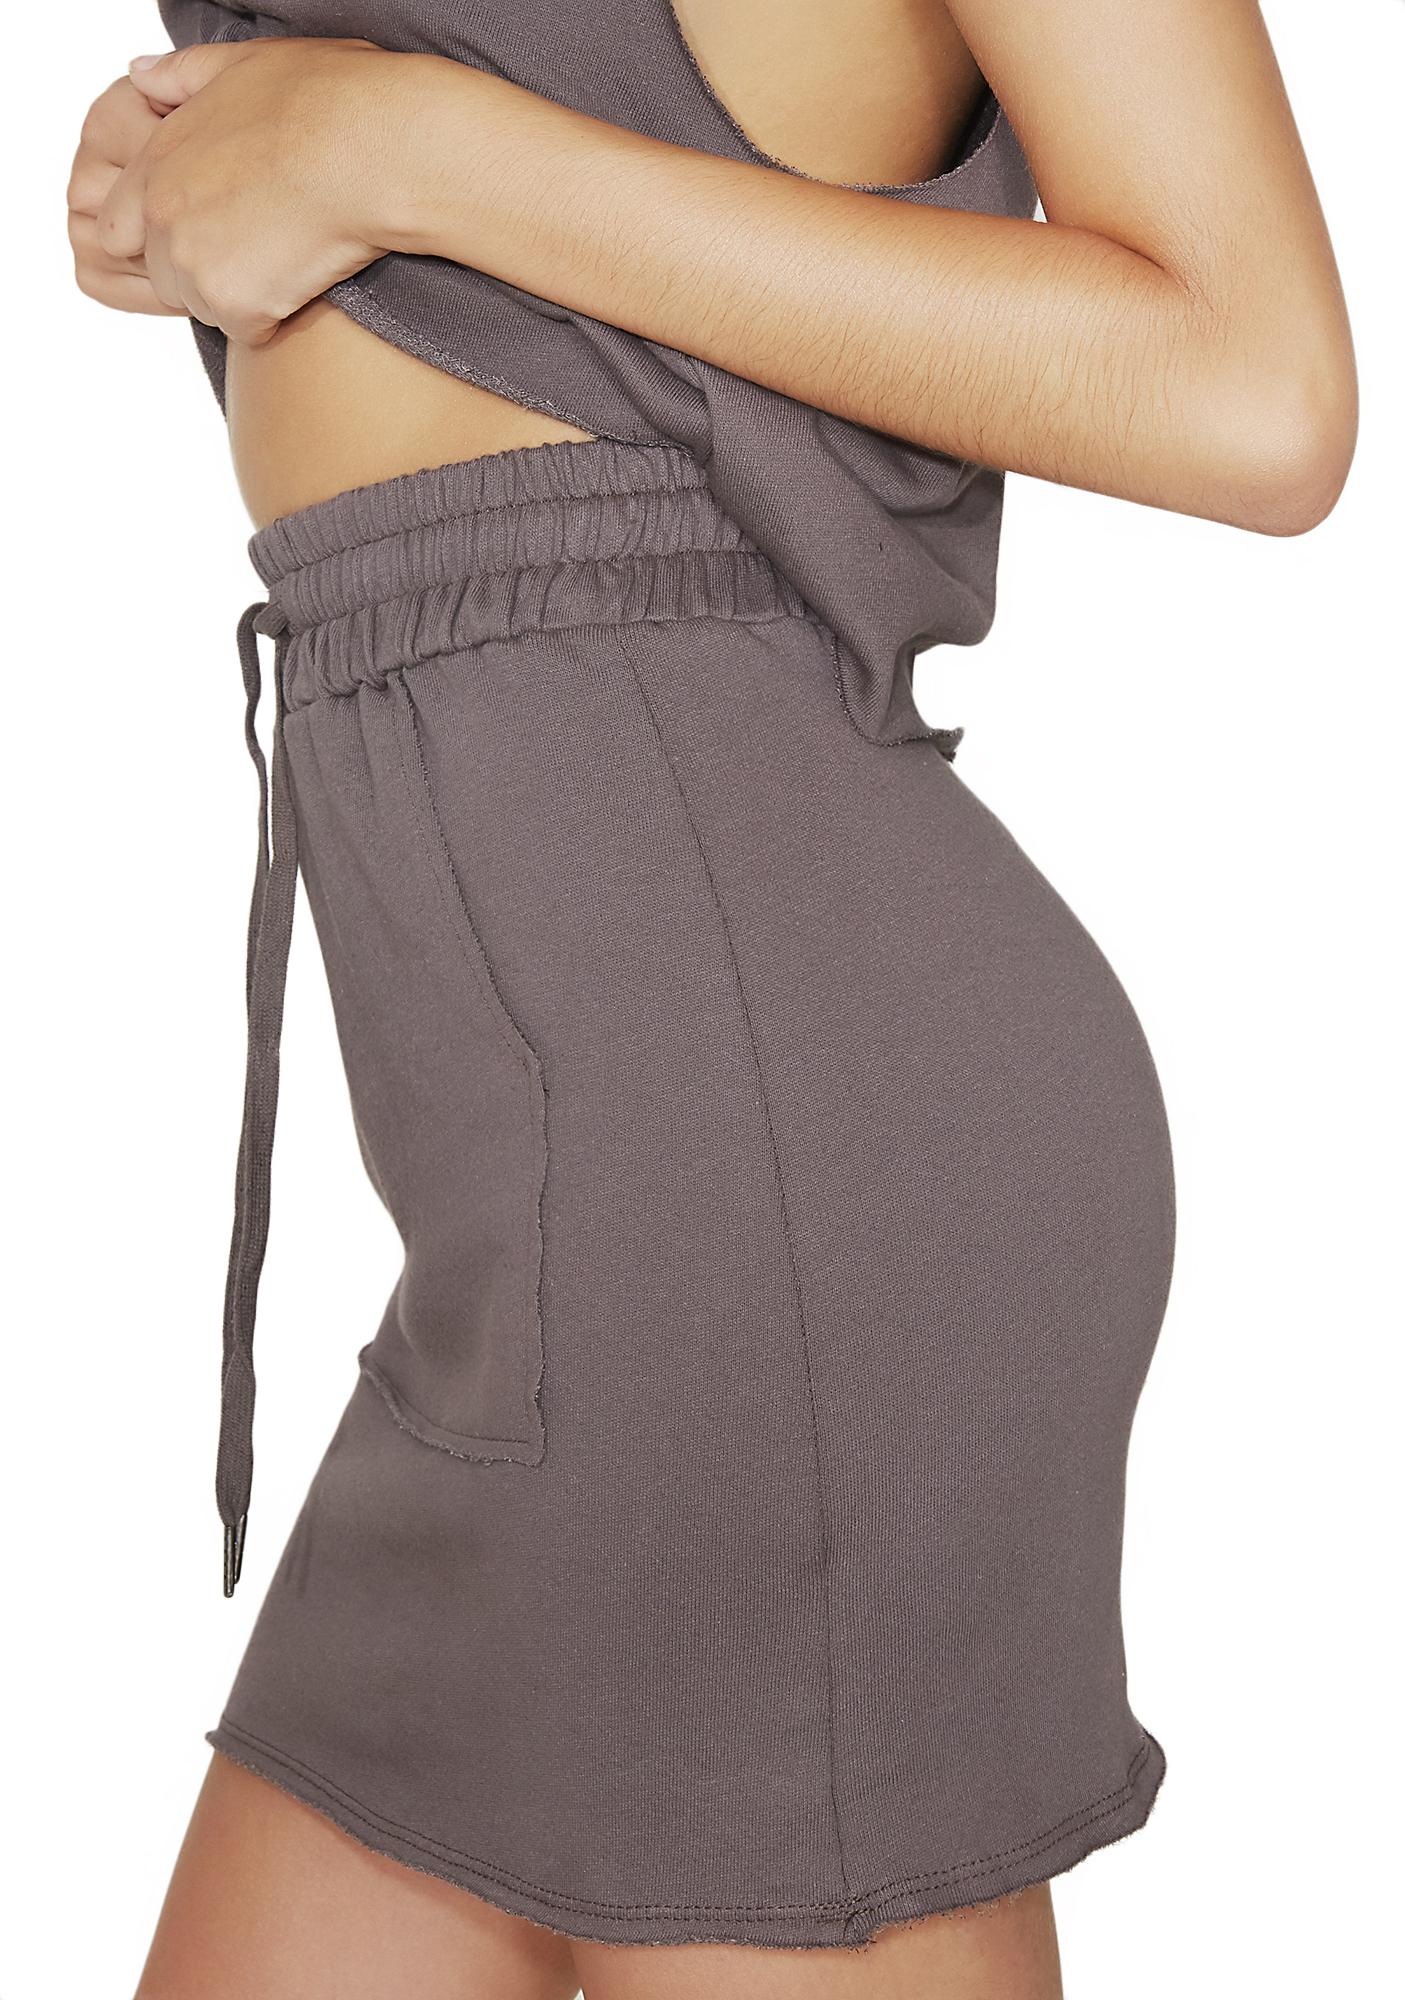 Sweatshirt Mini Drawstring Skirt Gray